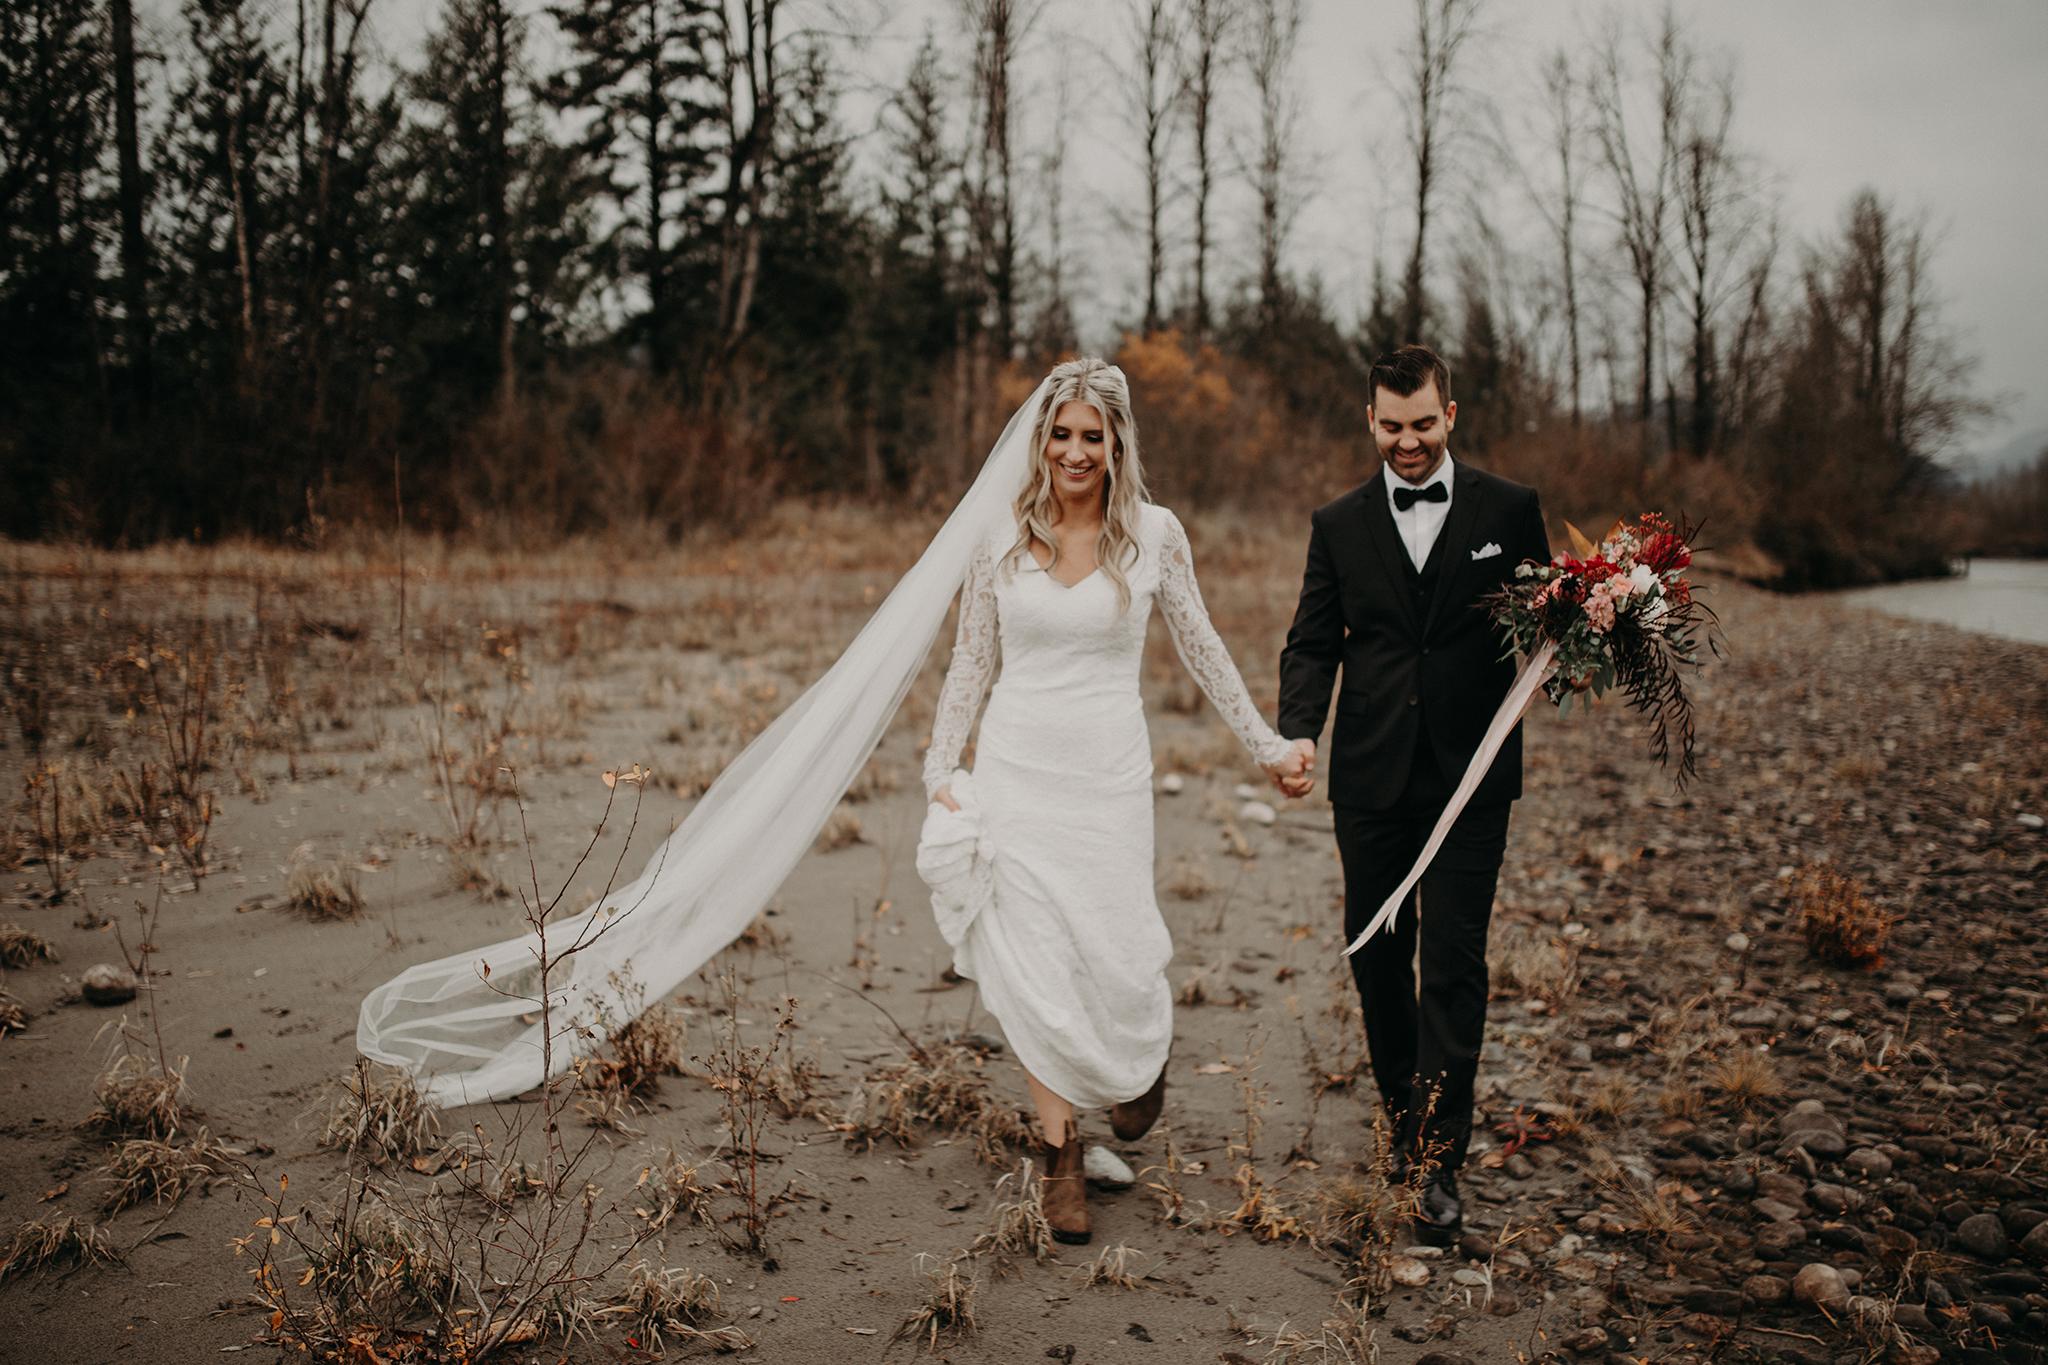 fraser_river_lodge_wedding_photographer036.JPG